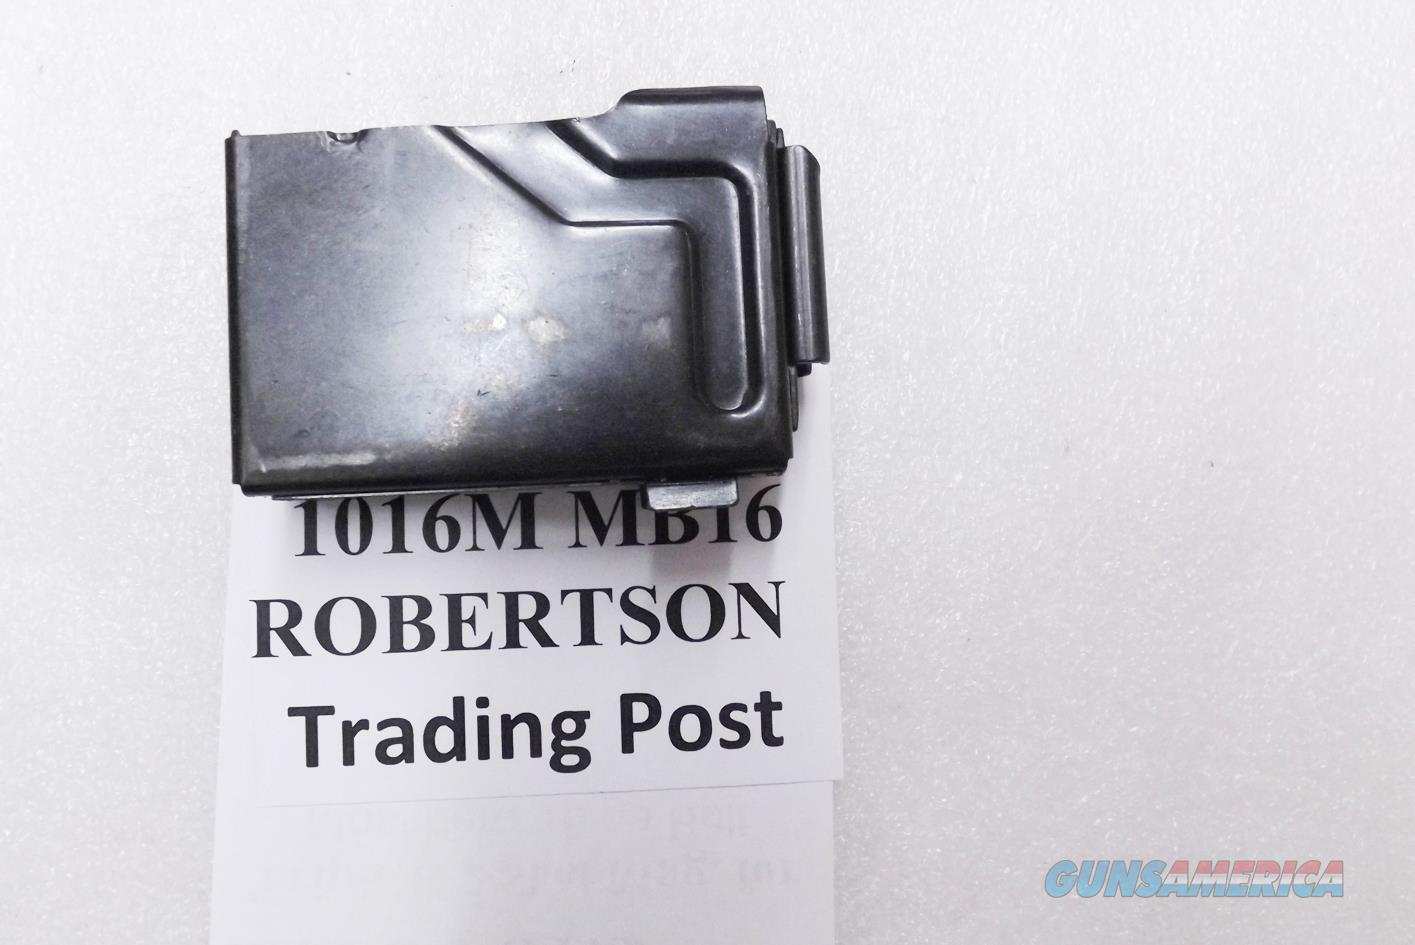 Triple K 2 Shot Magazine for Mossberg 190 series 16 gauge Bolt Action Shotguns 2 shot blued steel   Non-Guns > Magazines & Clips > Rifle Magazines > Other